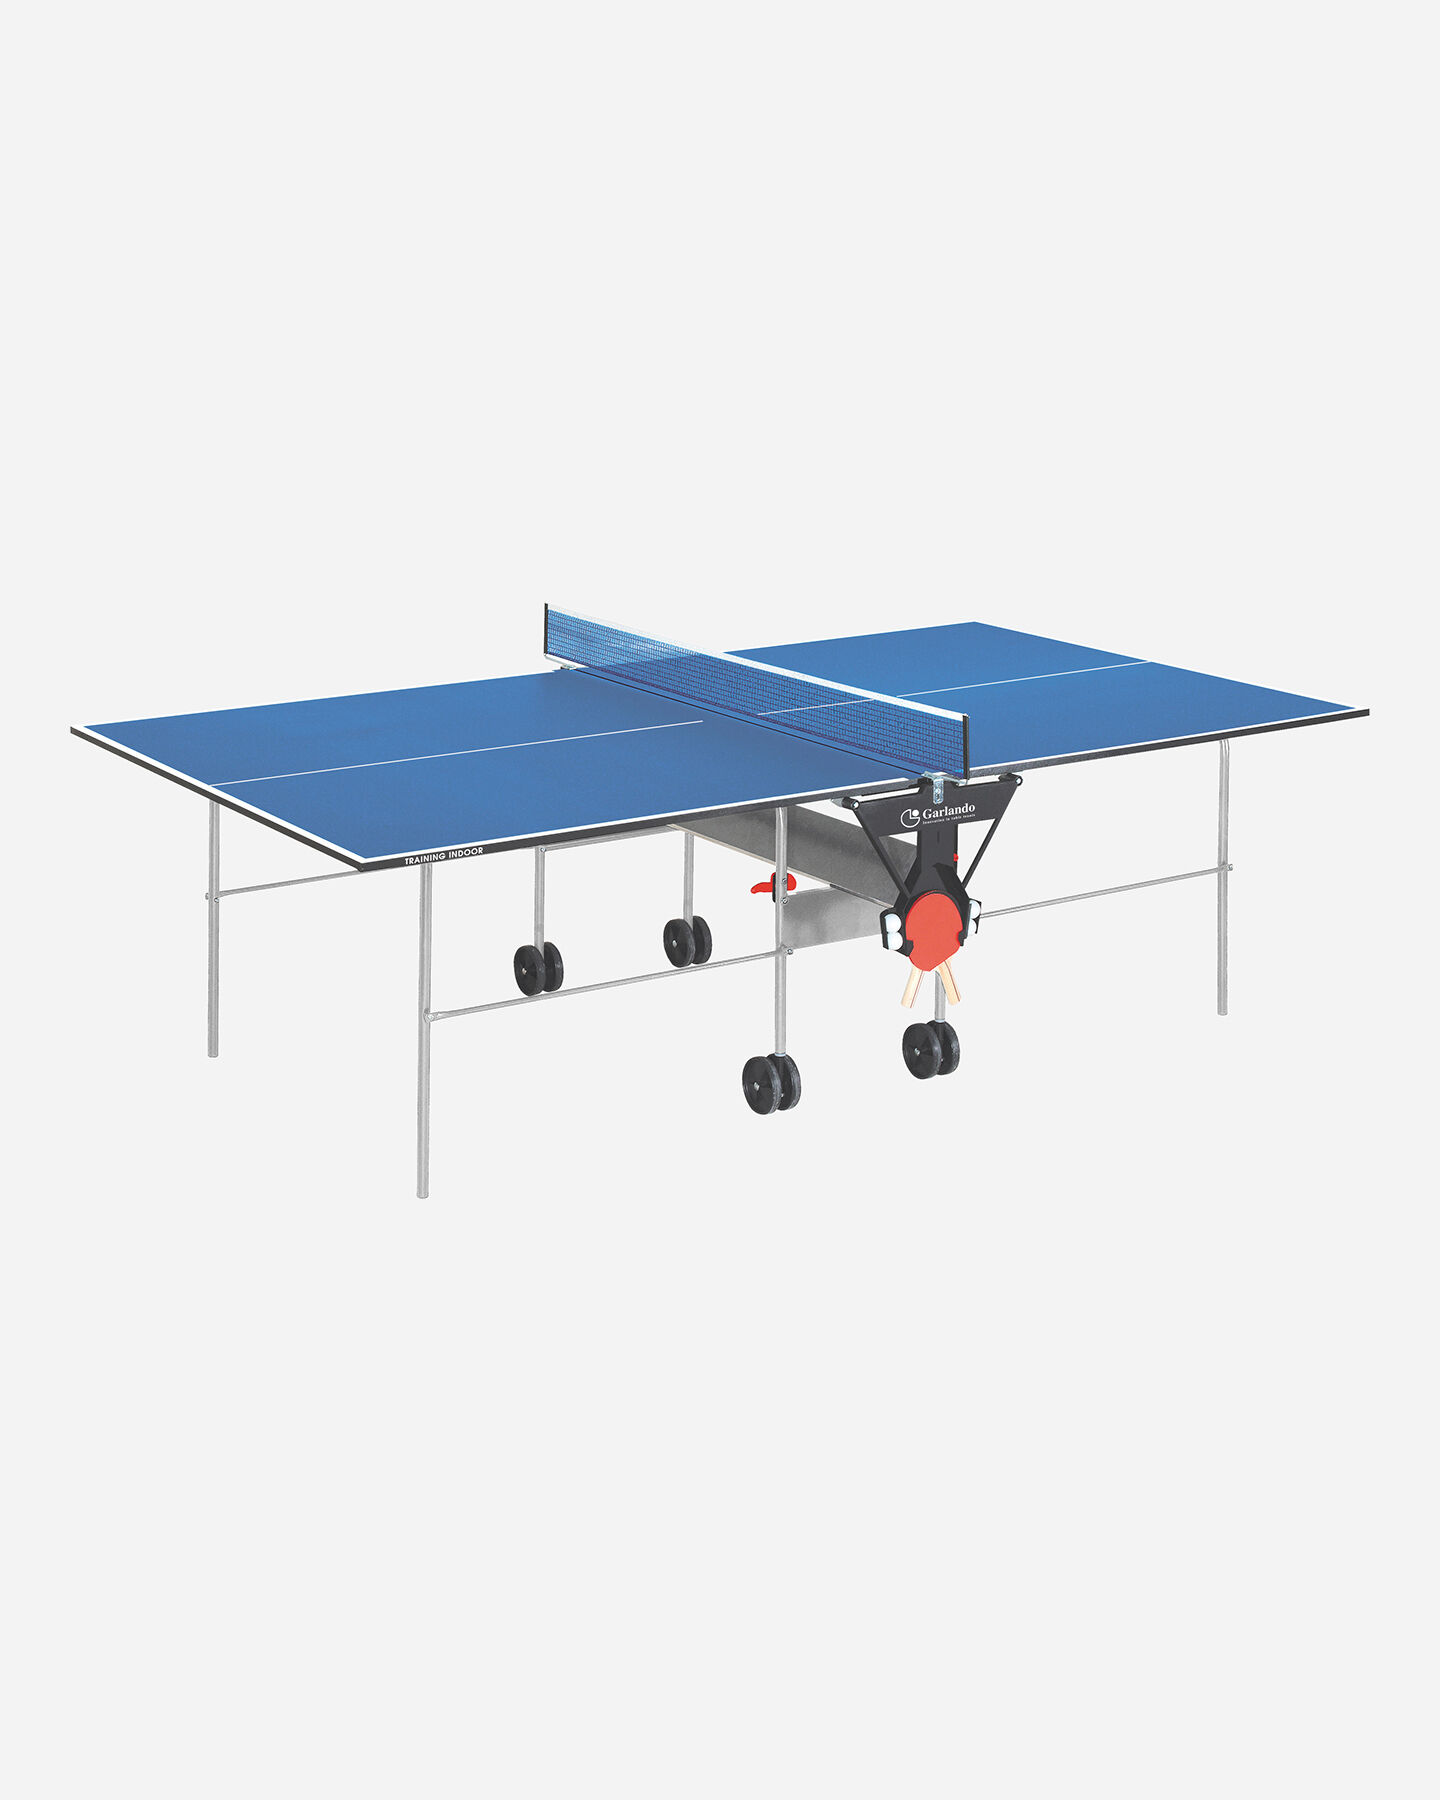 Tavolo ping pong GARLANDO TRAINING INDOOR S1251232|N.D.|UNI scatto 0